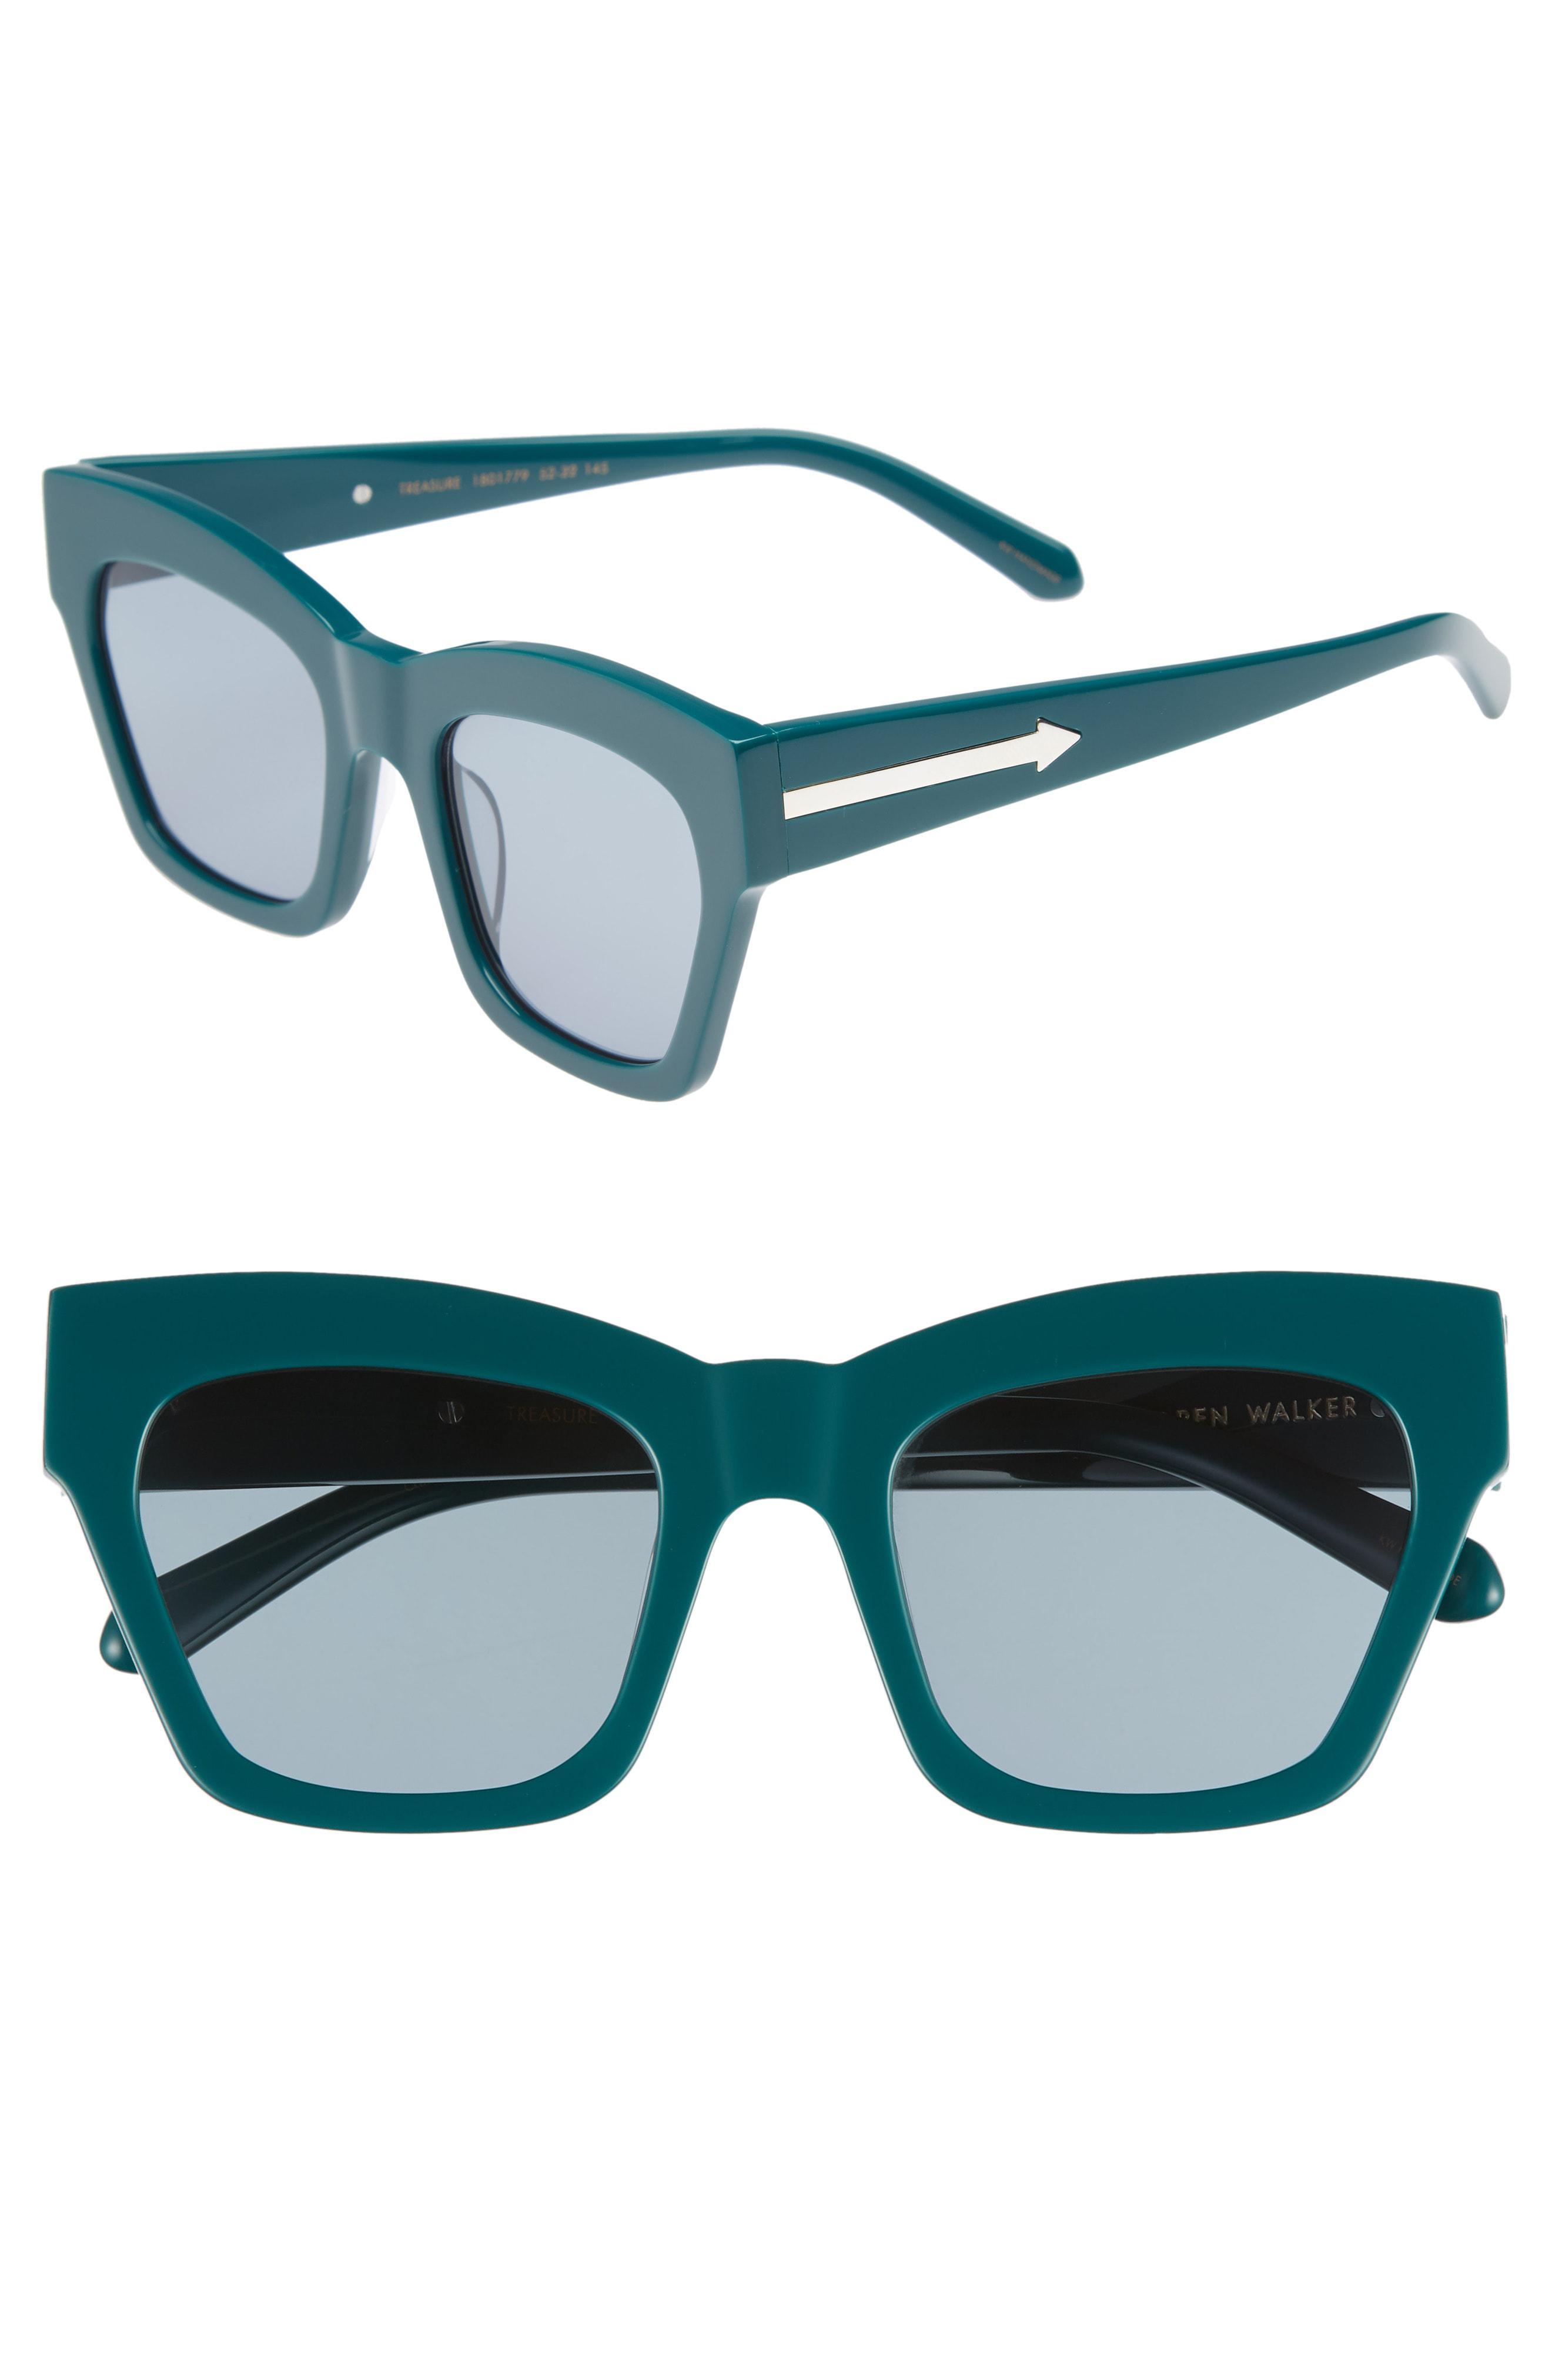 3cbe08429f Lyst - Karen Walker Treasure 52mm Cat Eye Sunglasses - in Blue ...